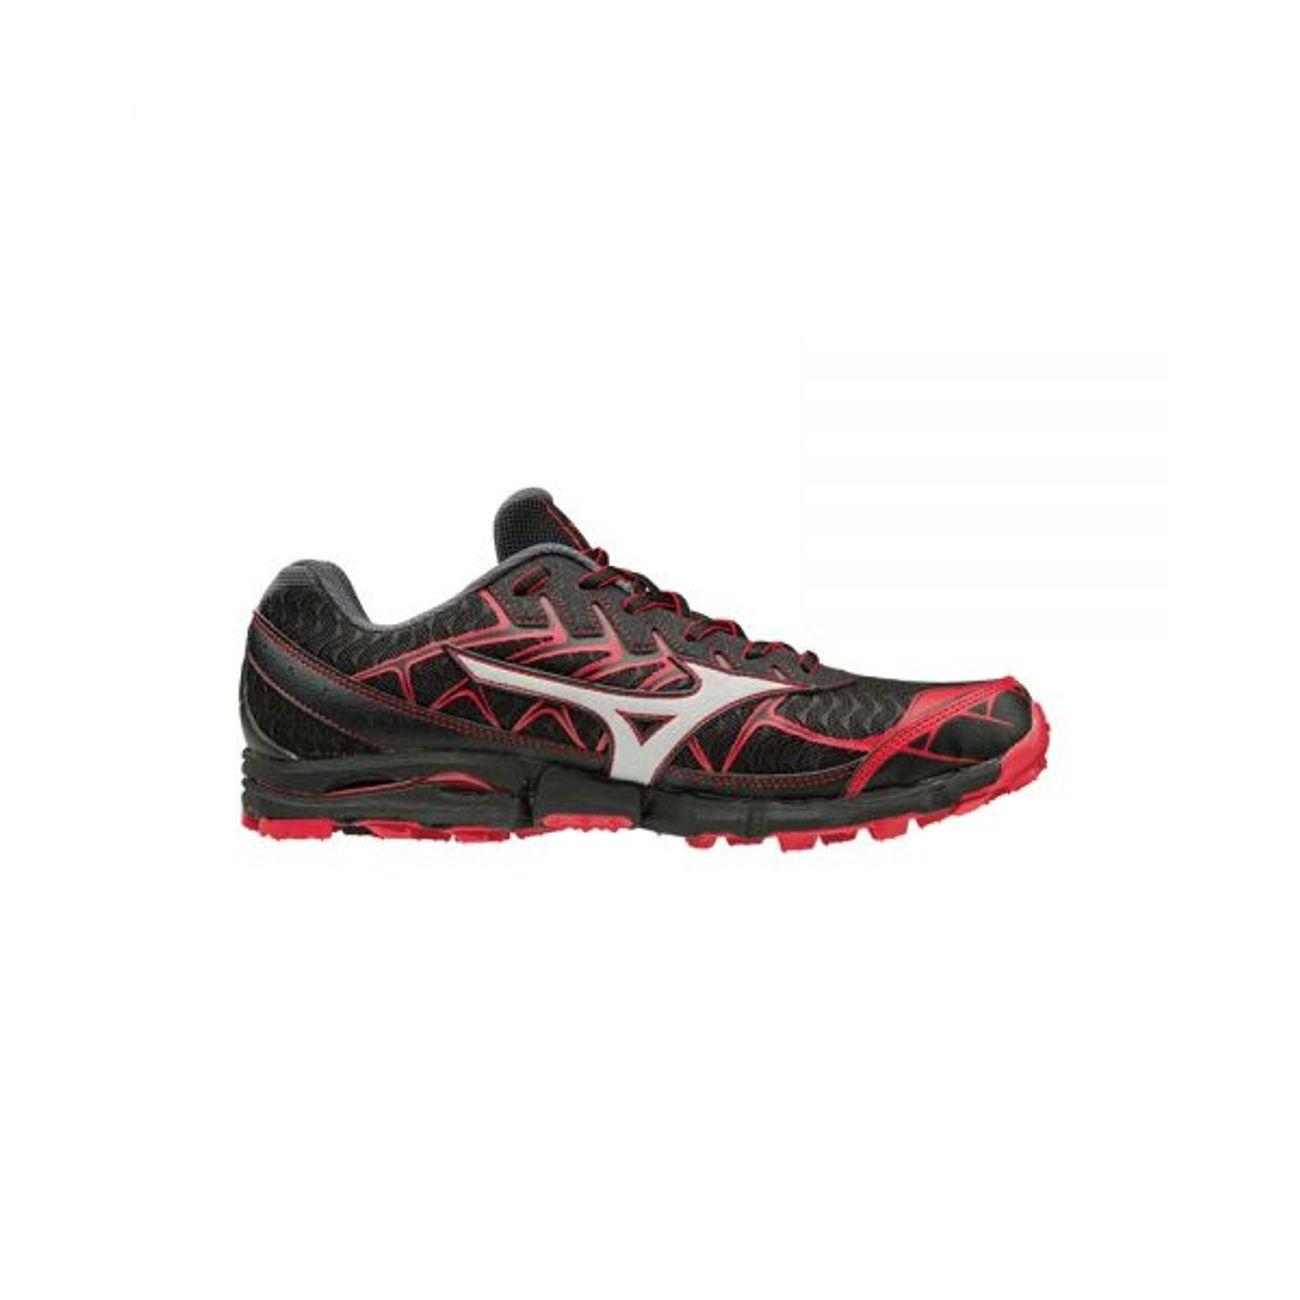 Mizuno Chaussure de trail Wave Hayate 4 Femme bGHPdR2mnu